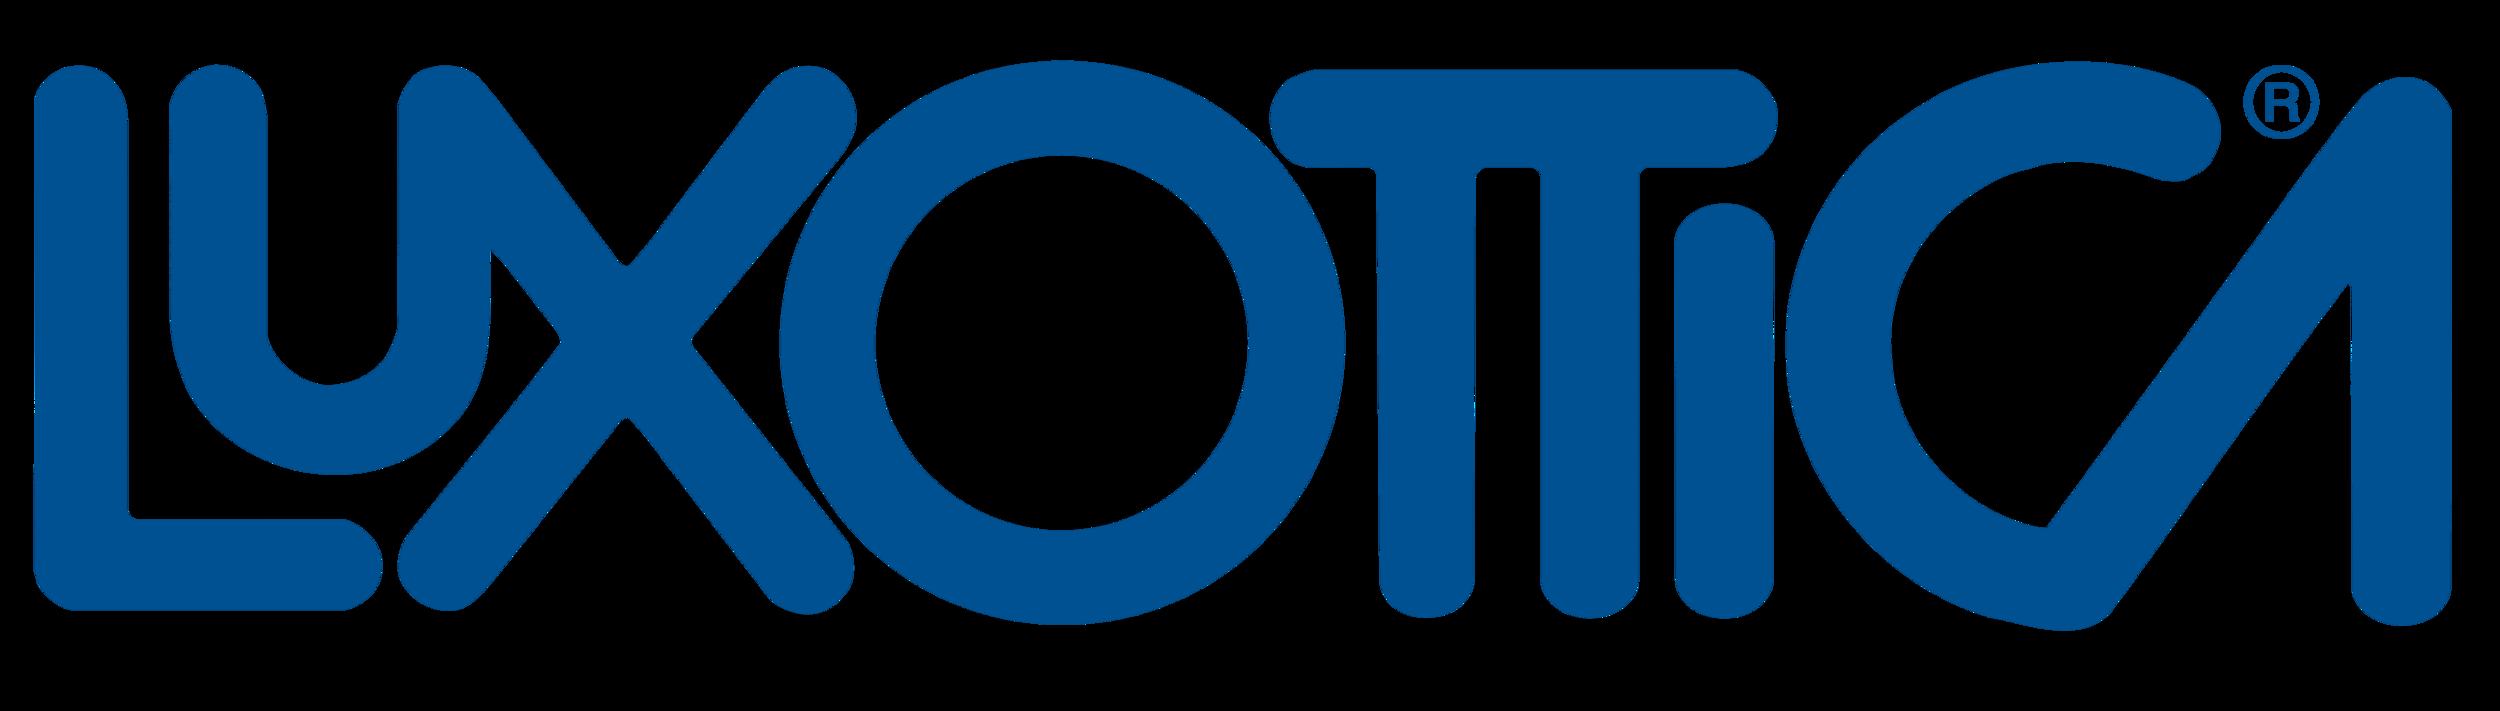 Luxottica_logo.png